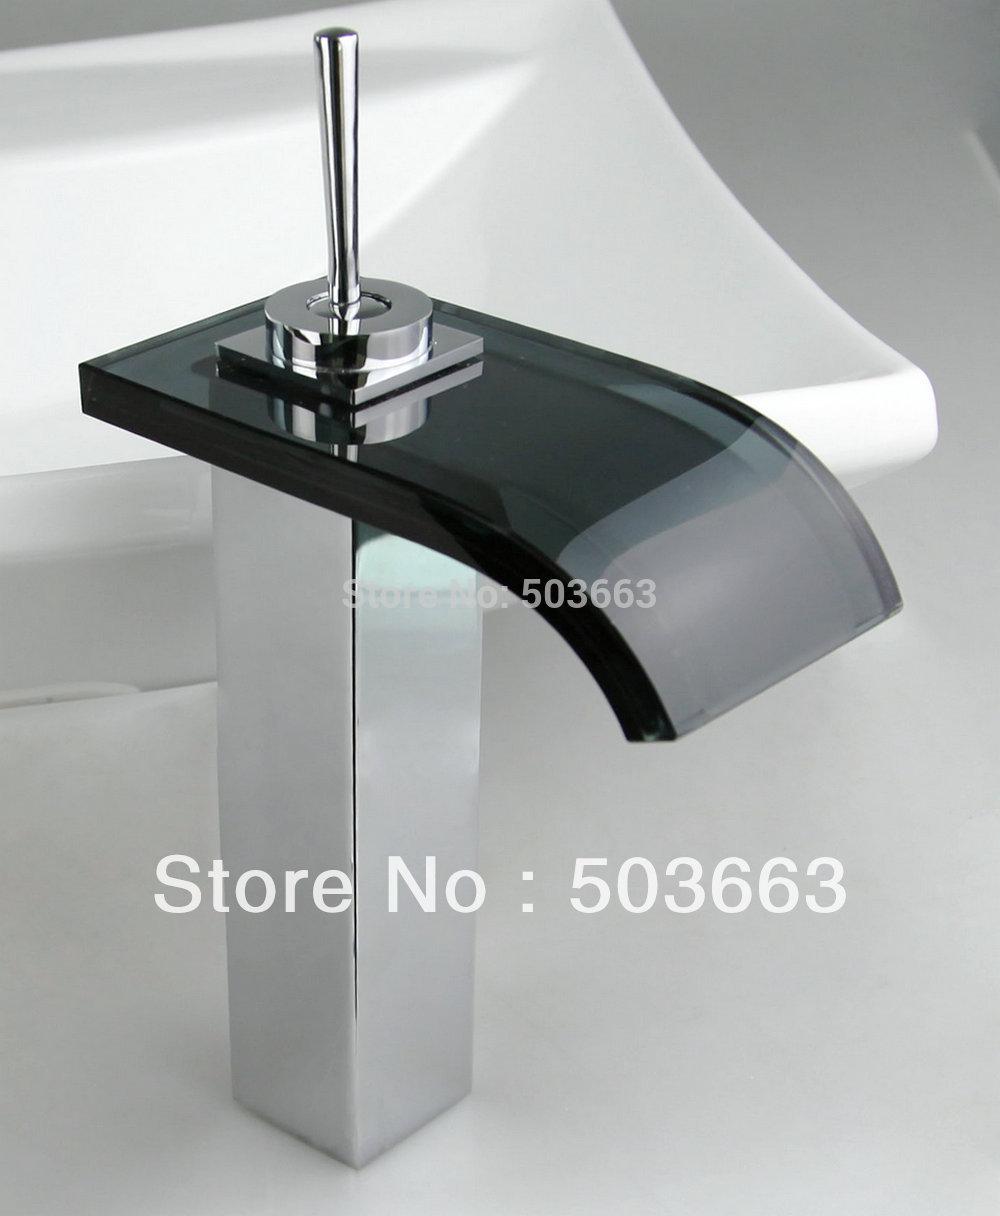 California robinet de salle de bain mitigeur cascade for Robinetterie haut de gamme pour salle de bain